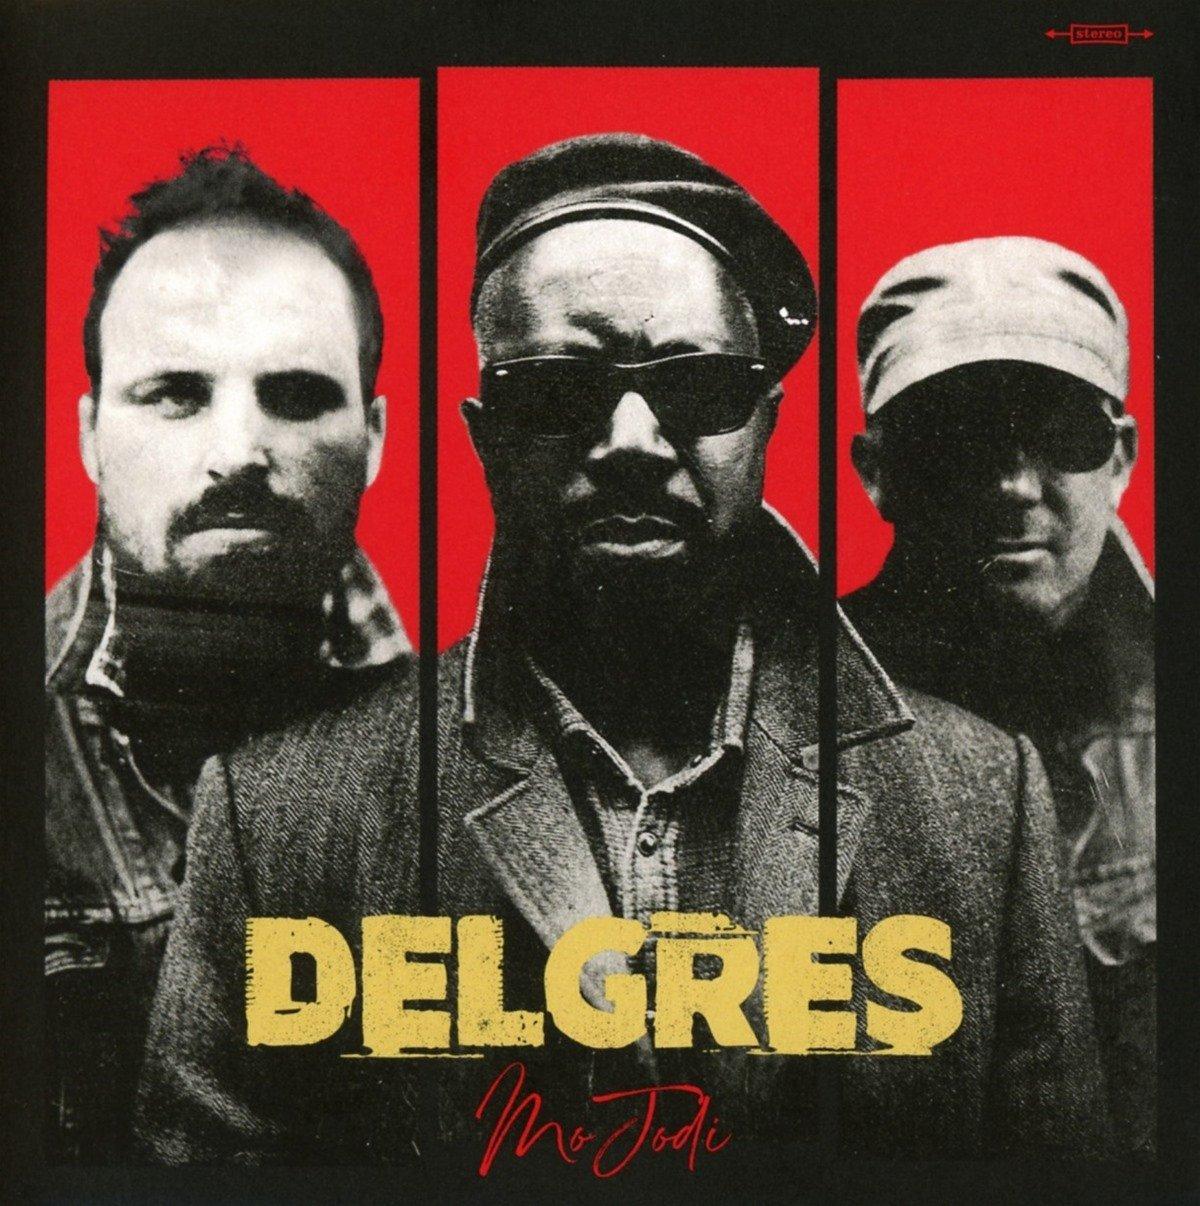 Delgres album Mo Jodi